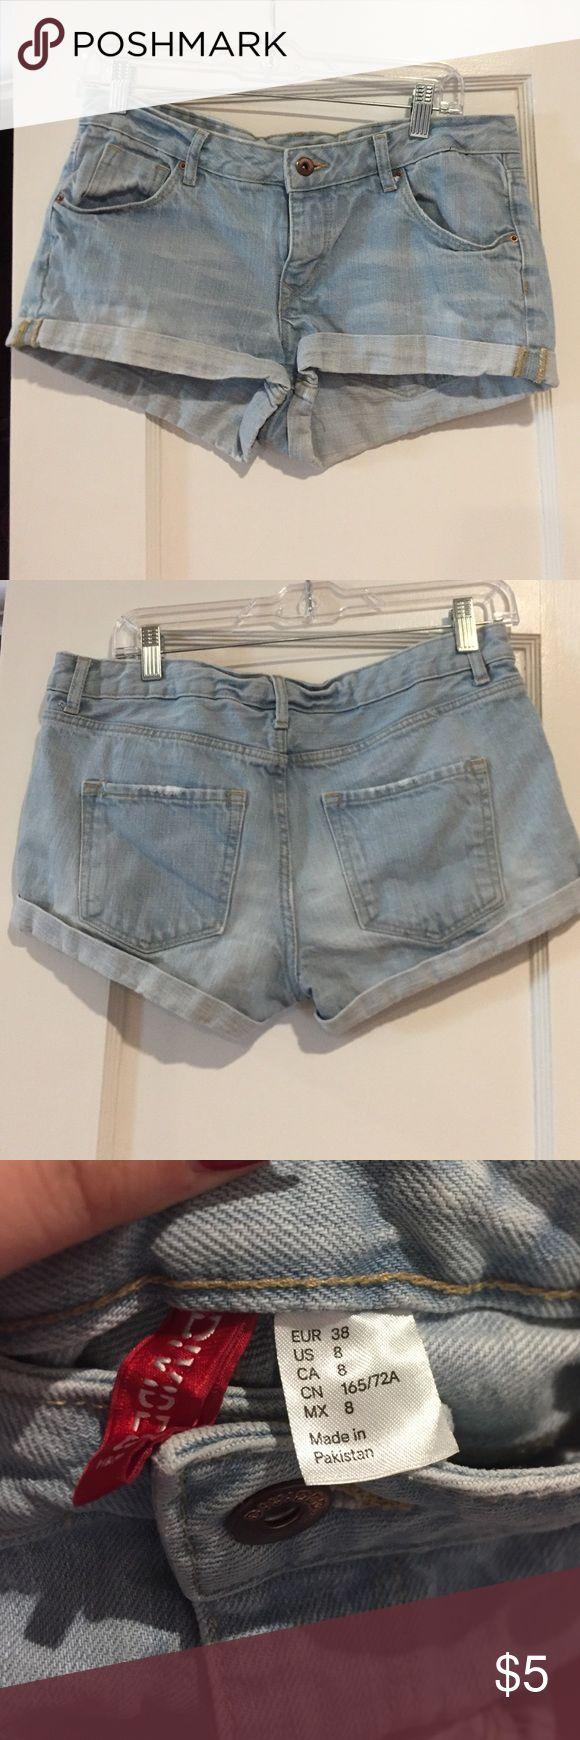 Light denim blue jean shorts Light blue denim blue jean shorts Shorts